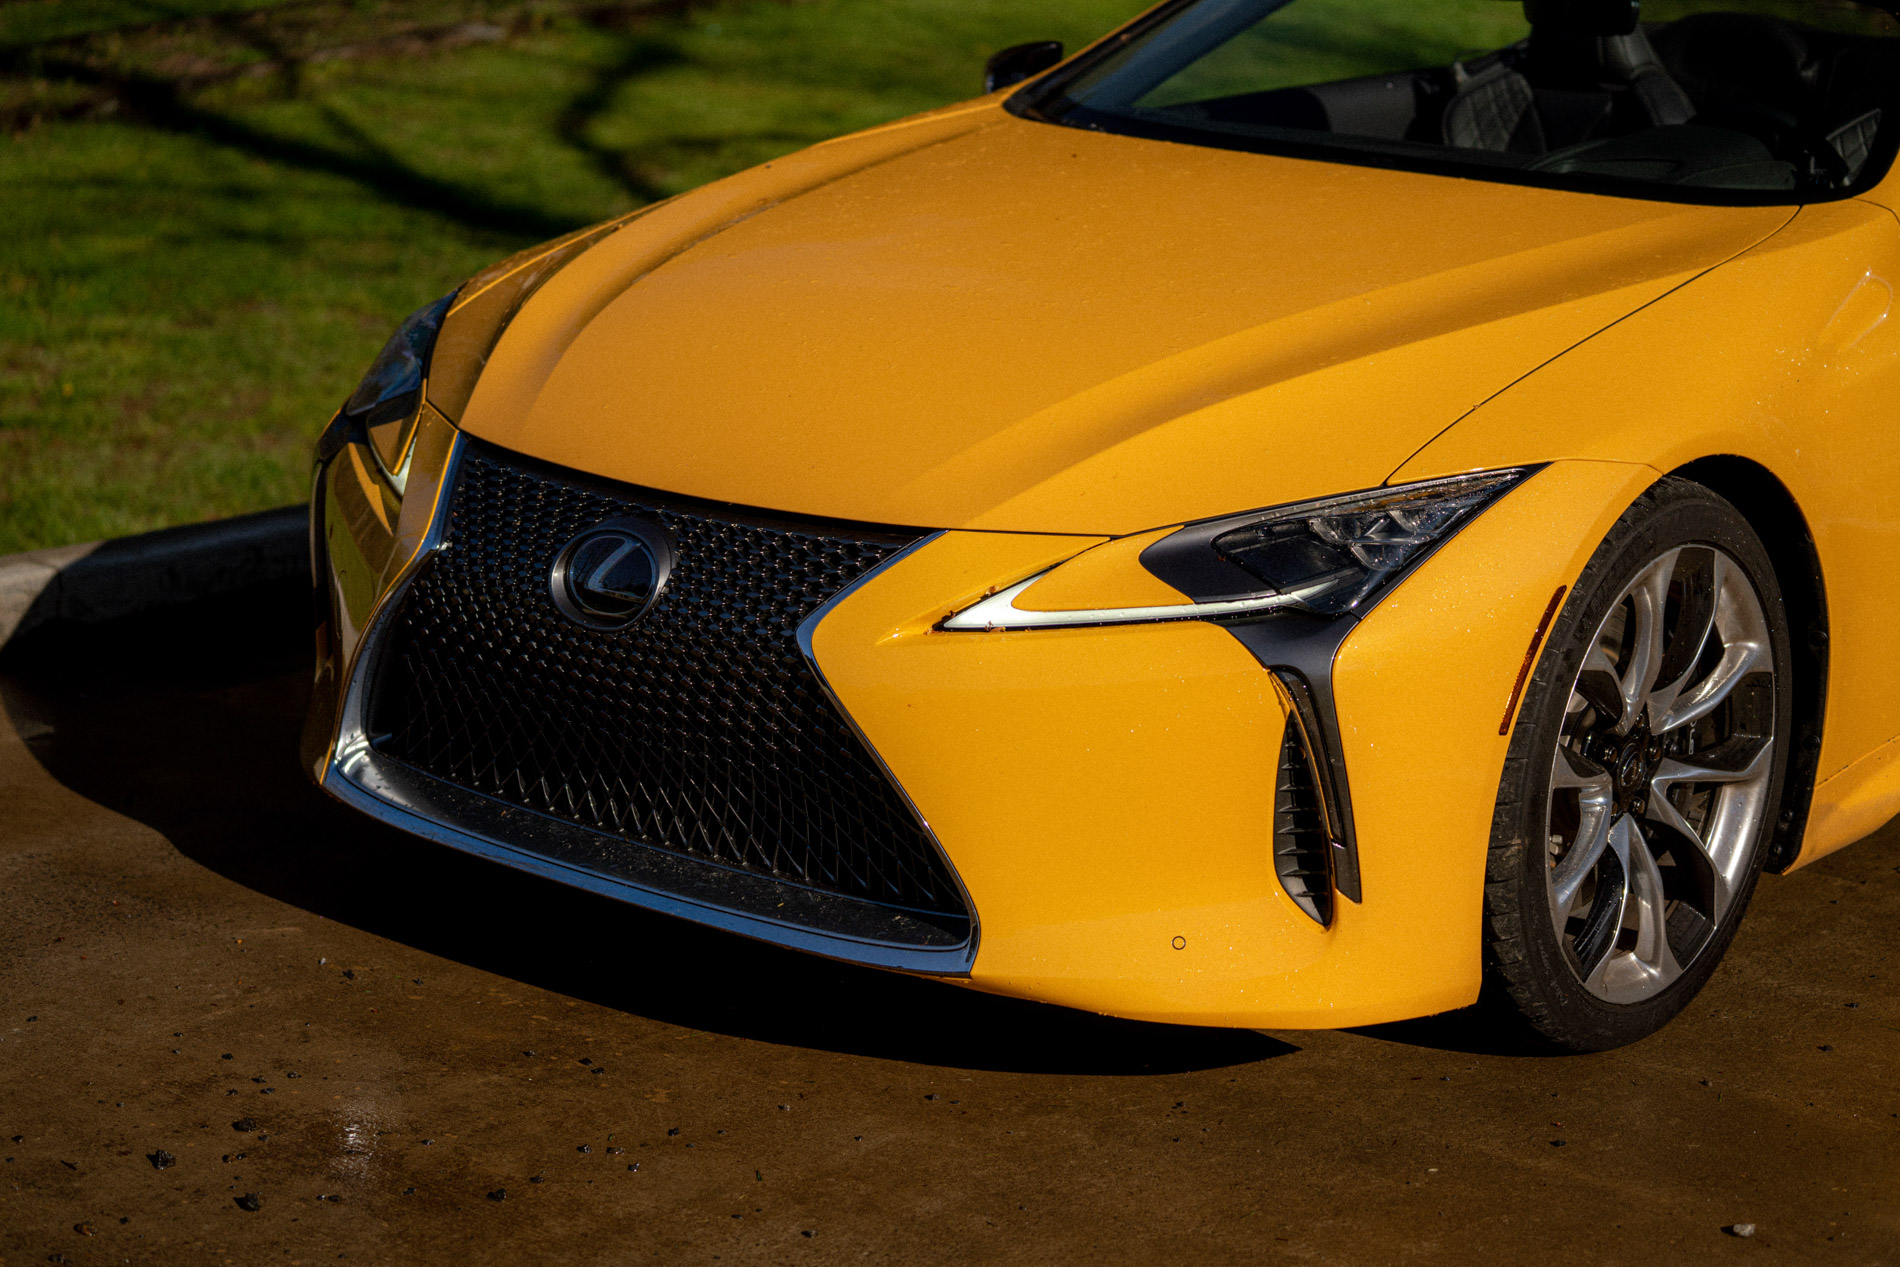 2020 Lexus LC500 Convertible